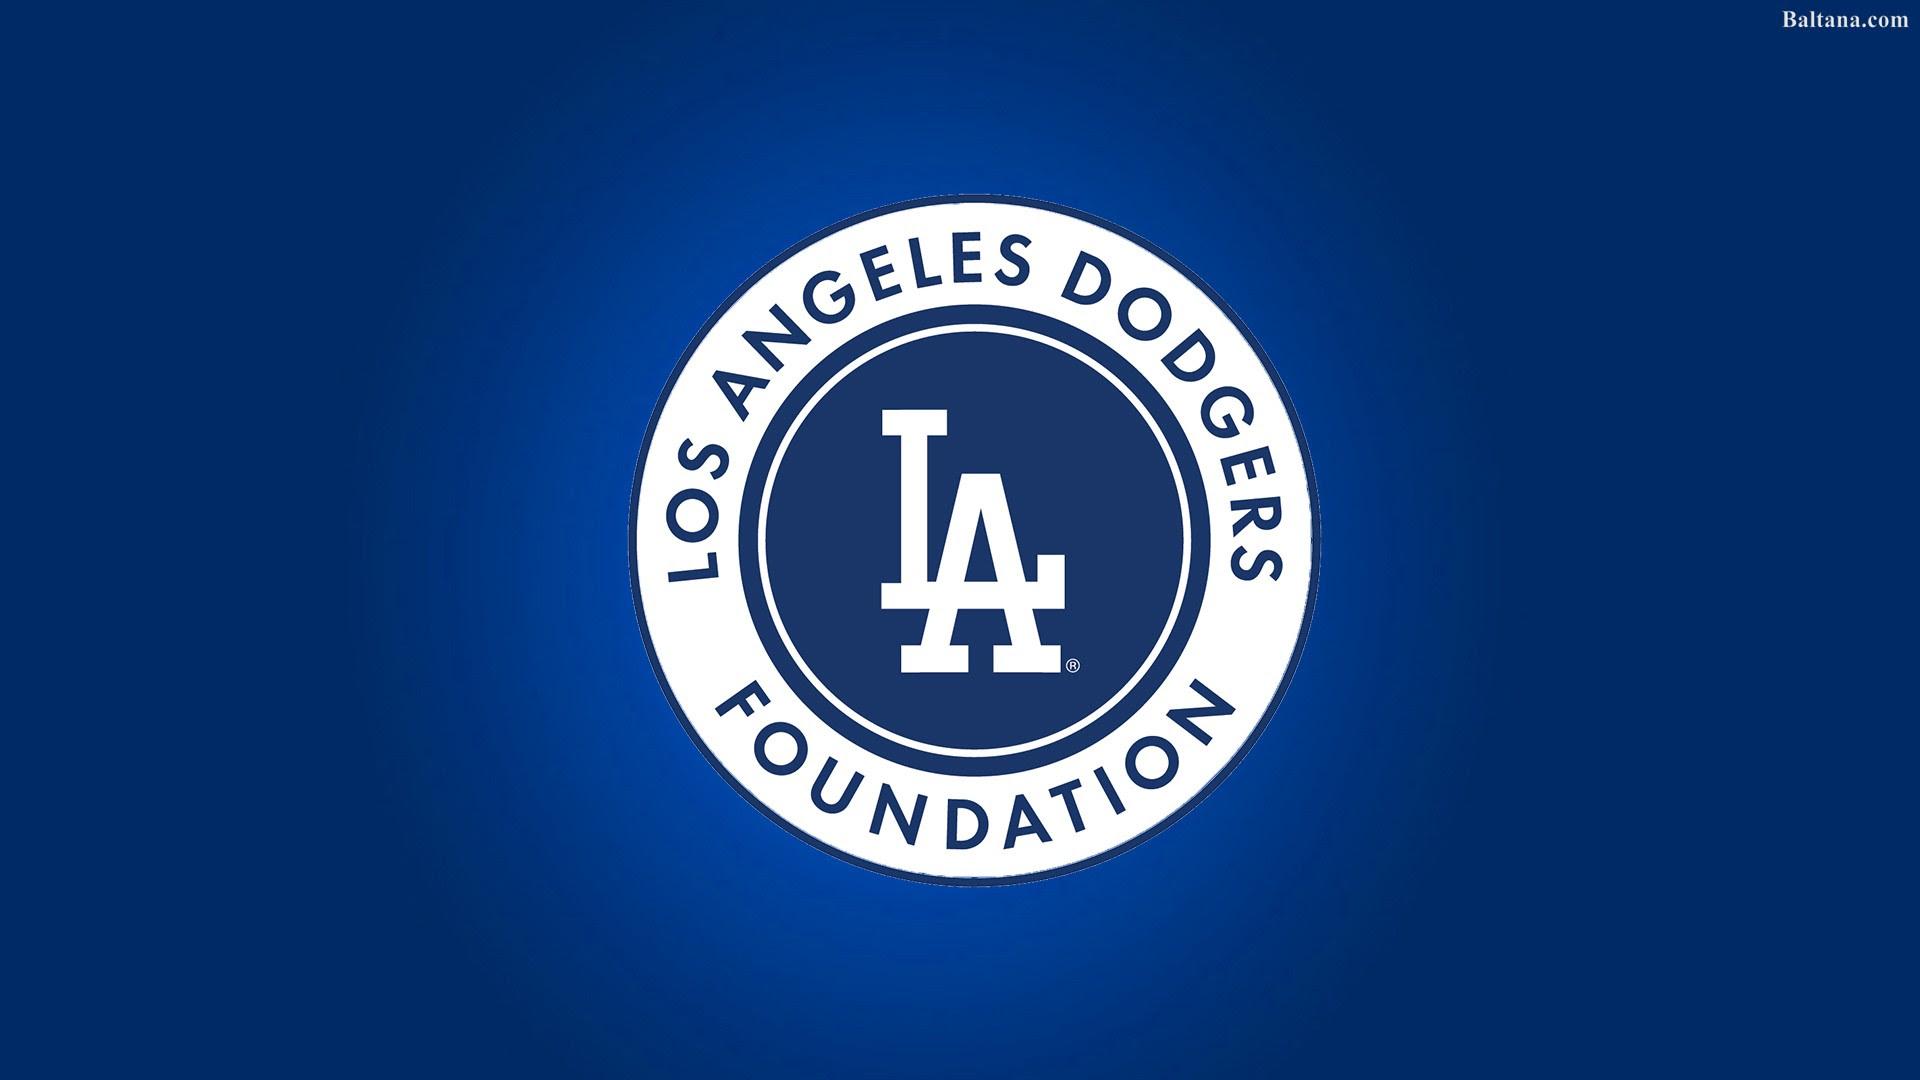 Los Angeles Dodgers Hd Desktop Wallpaper 33156 Baltana